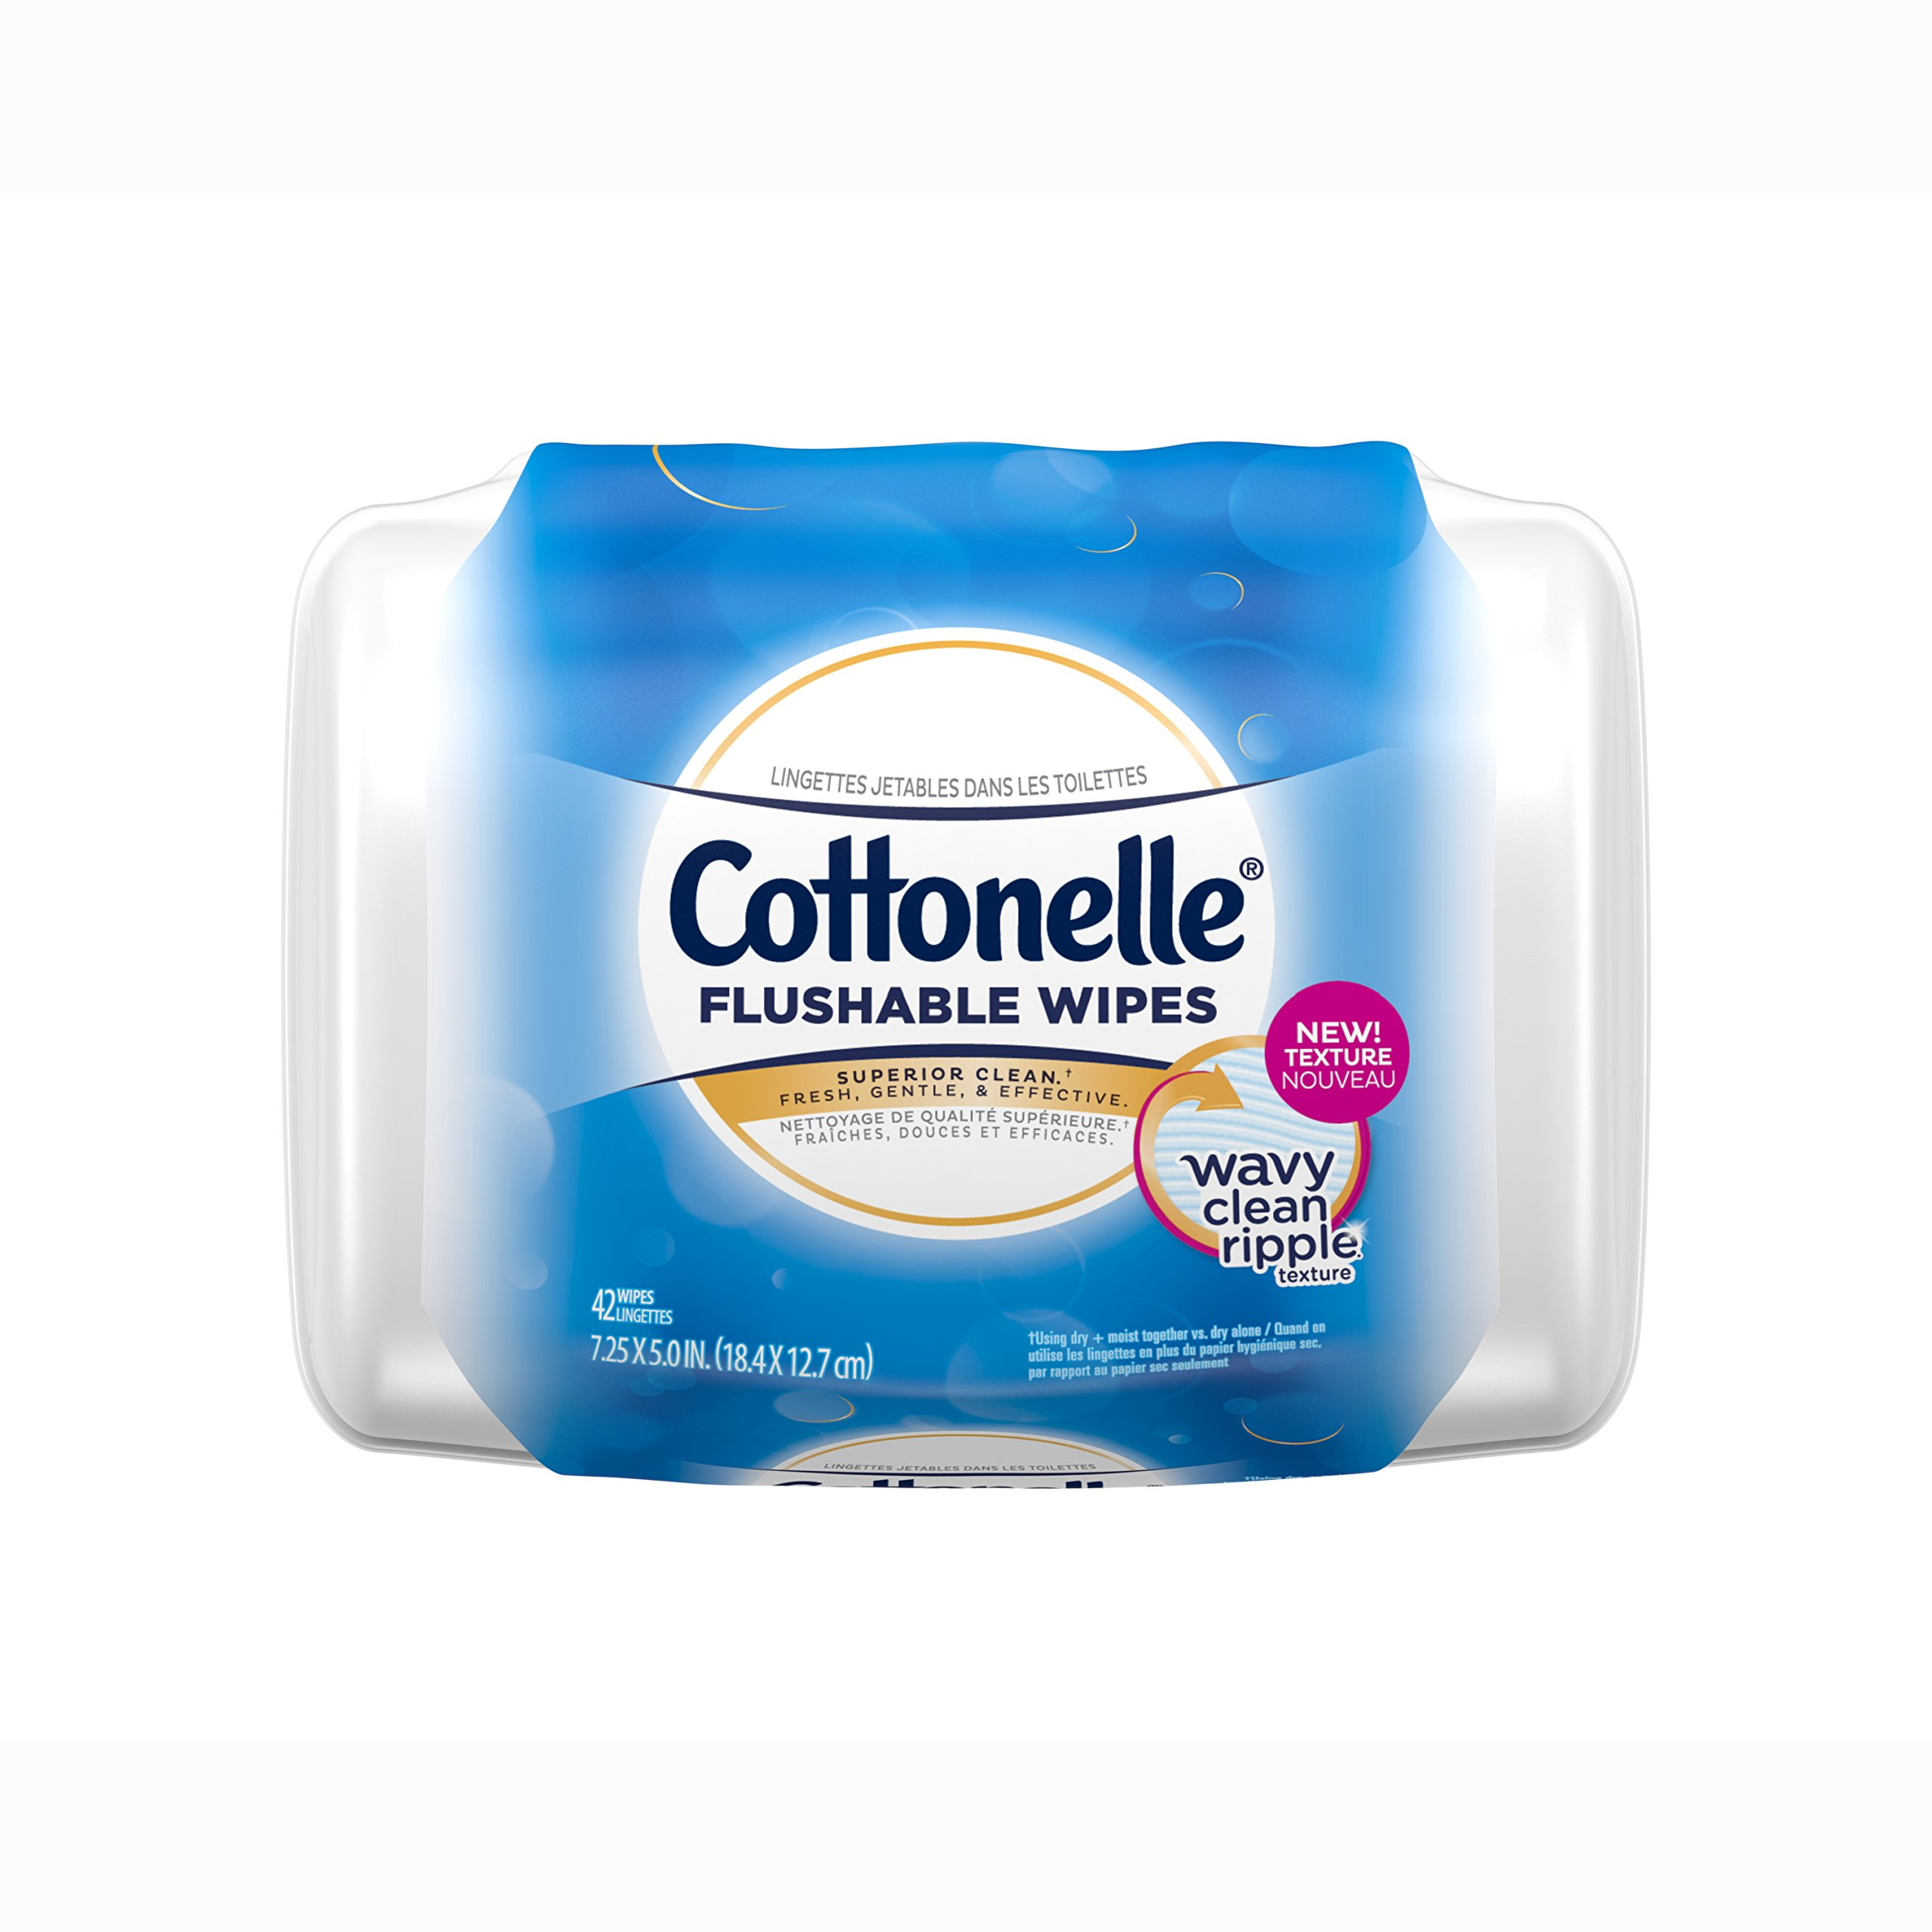 Cottonelle FreshCare Flushable Wipes Refill Tub, 42 Flushable Wet Wipes, Lightly Scented